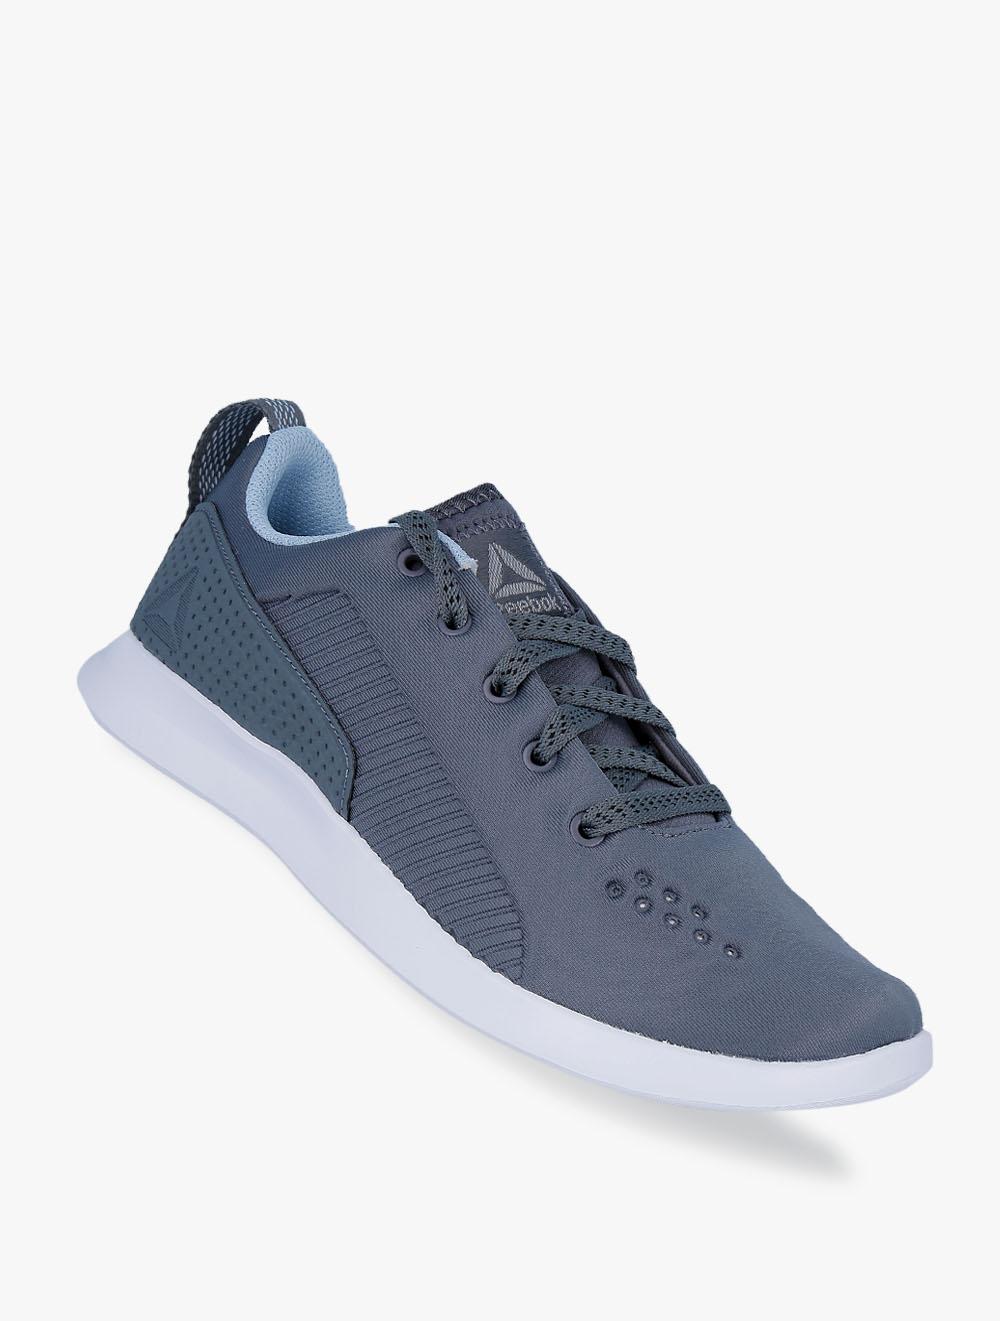 Reebok Evazure DMX Lite Women's Running Shoes